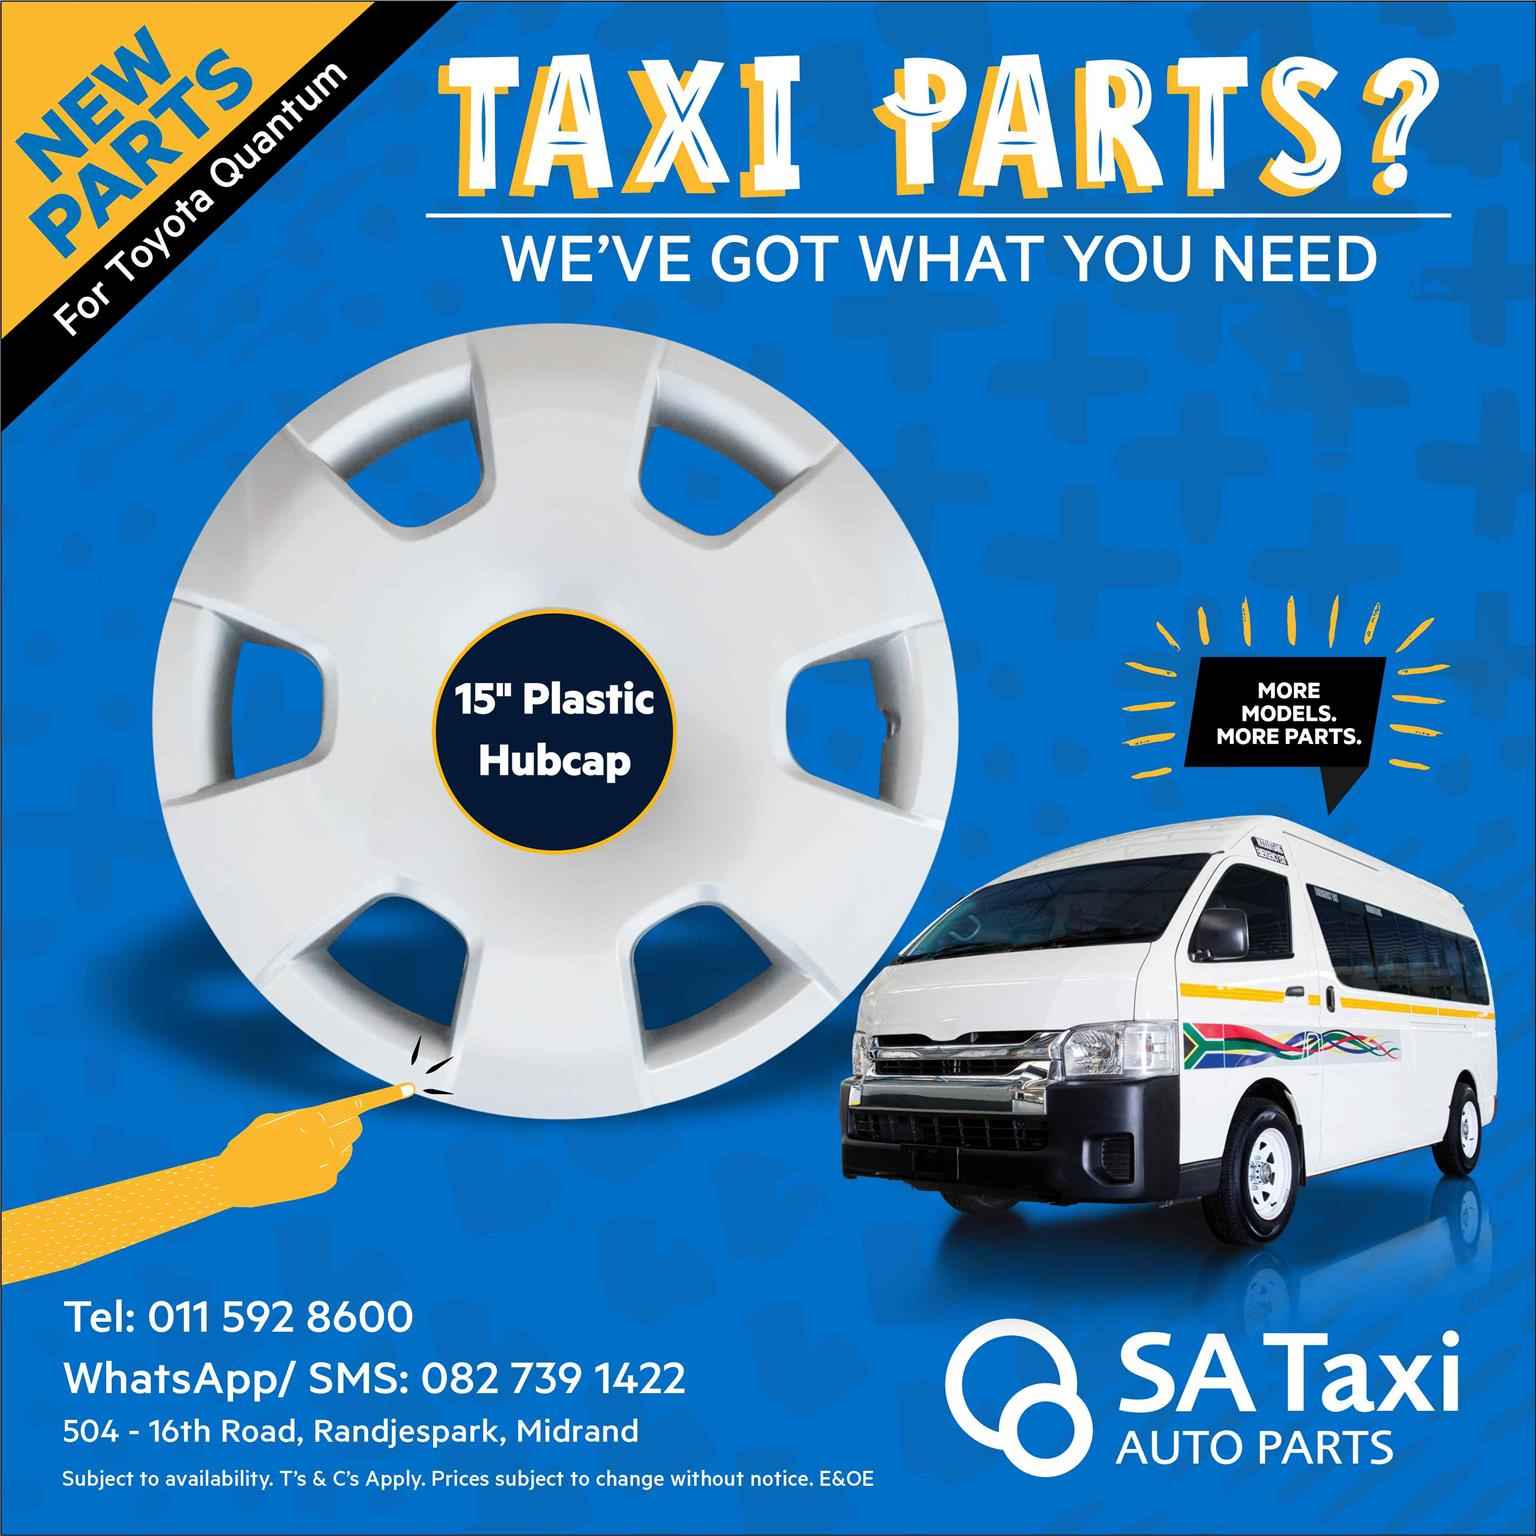 "New 15"" plastic Hubcap suitable for Toyota Quantum -SA Taxi Auto Parts"